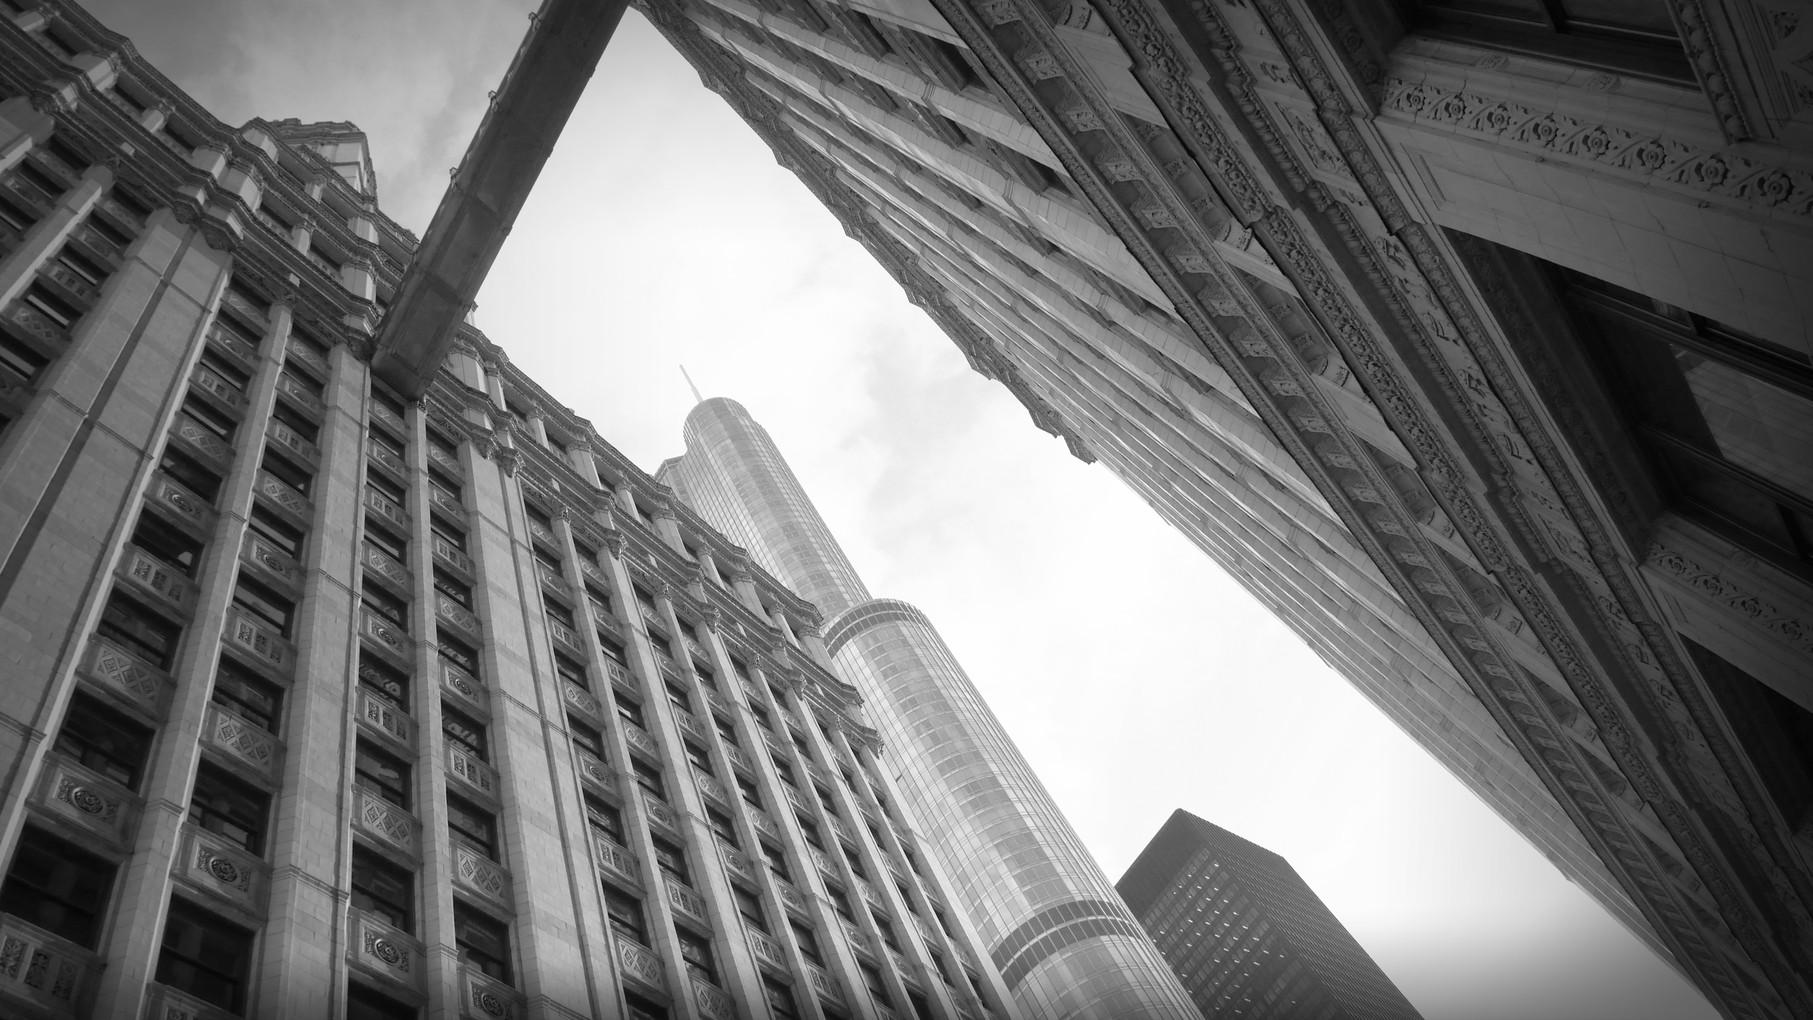 chicago-ponte-aerea.jpg